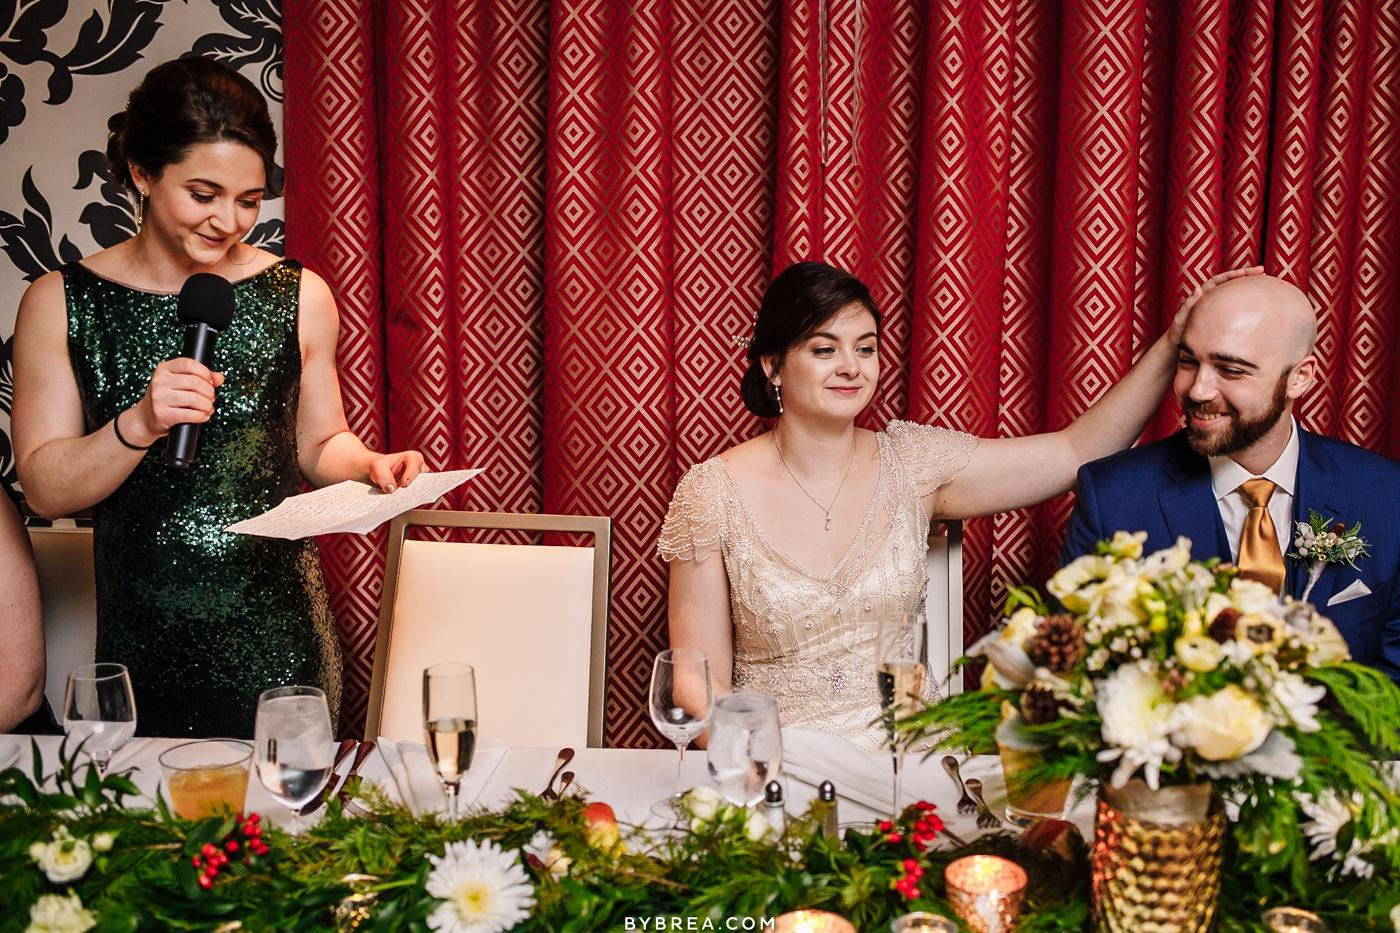 Photo of bride rubbing grooms head during speeches Baltimore wedding